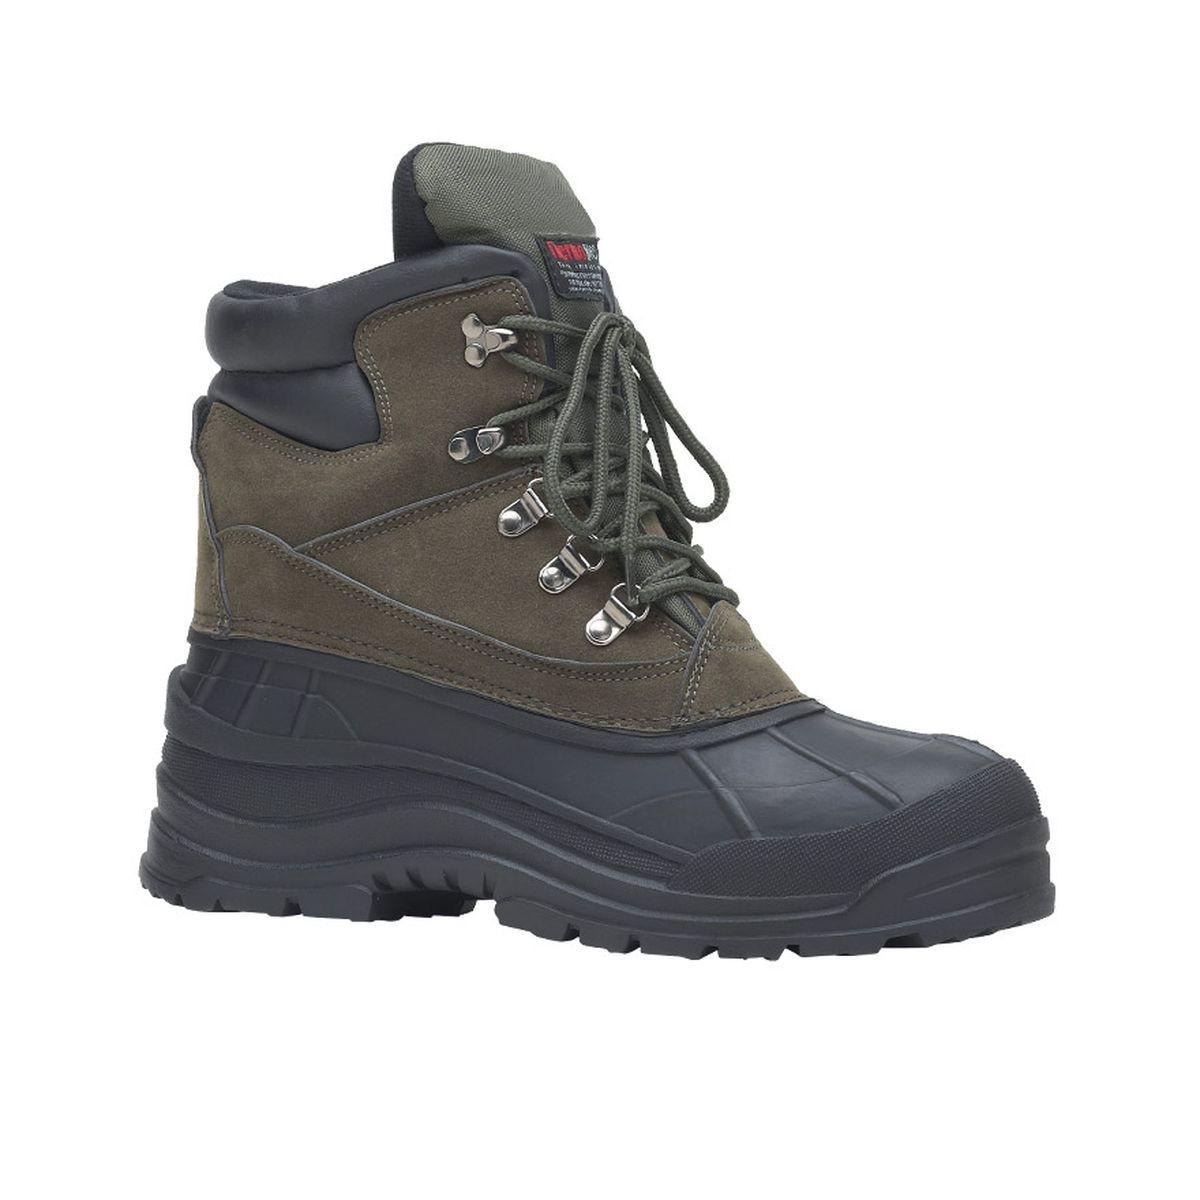 Chaussures QUEBEC kaki T41